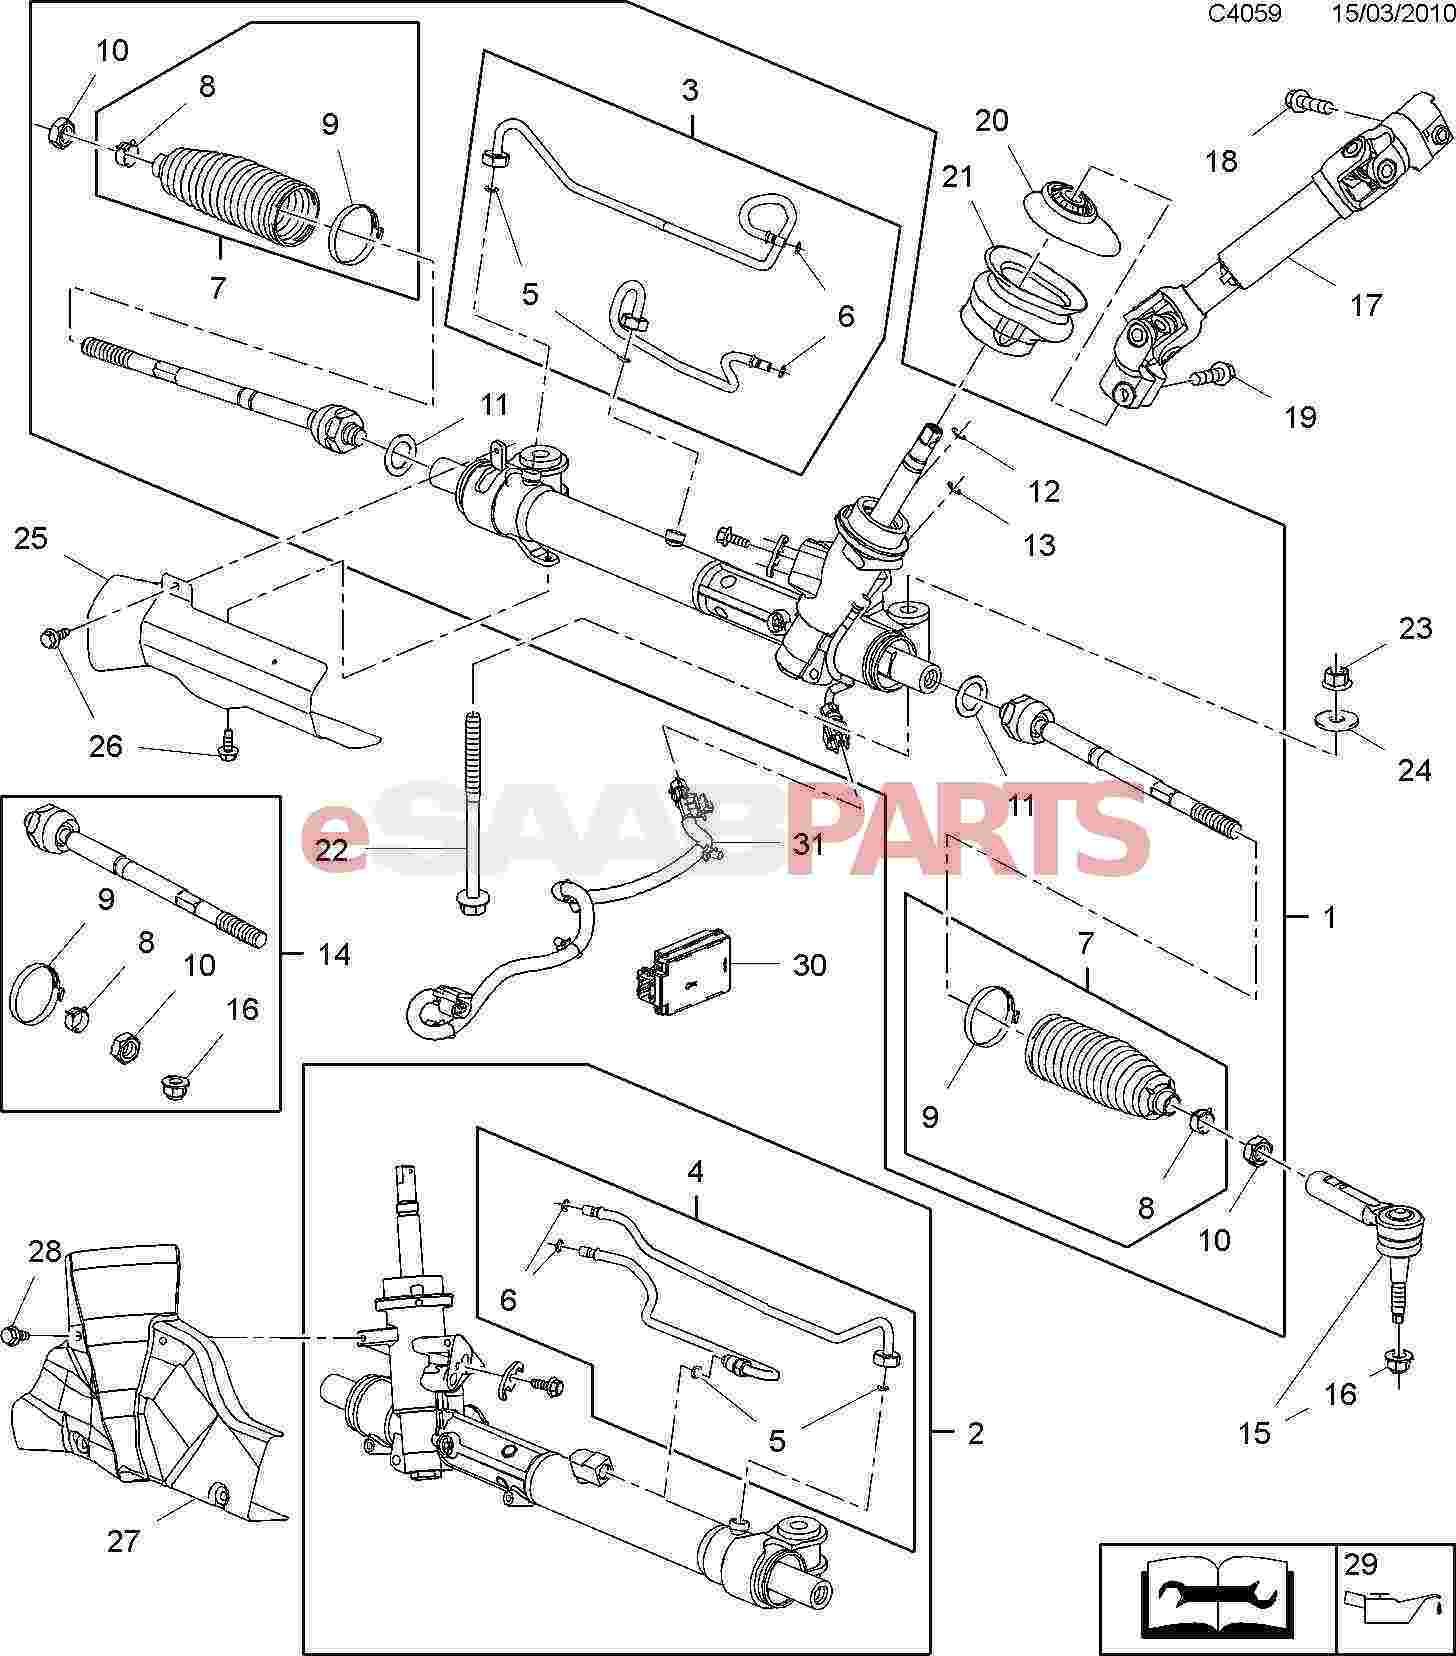 Part Power Steering Rack Diagram Modern Design Of Wiring Gear Box 20794887 Saab Control Unit Genuine Parts From Esaabparts Com Rh Ford Pump Gm